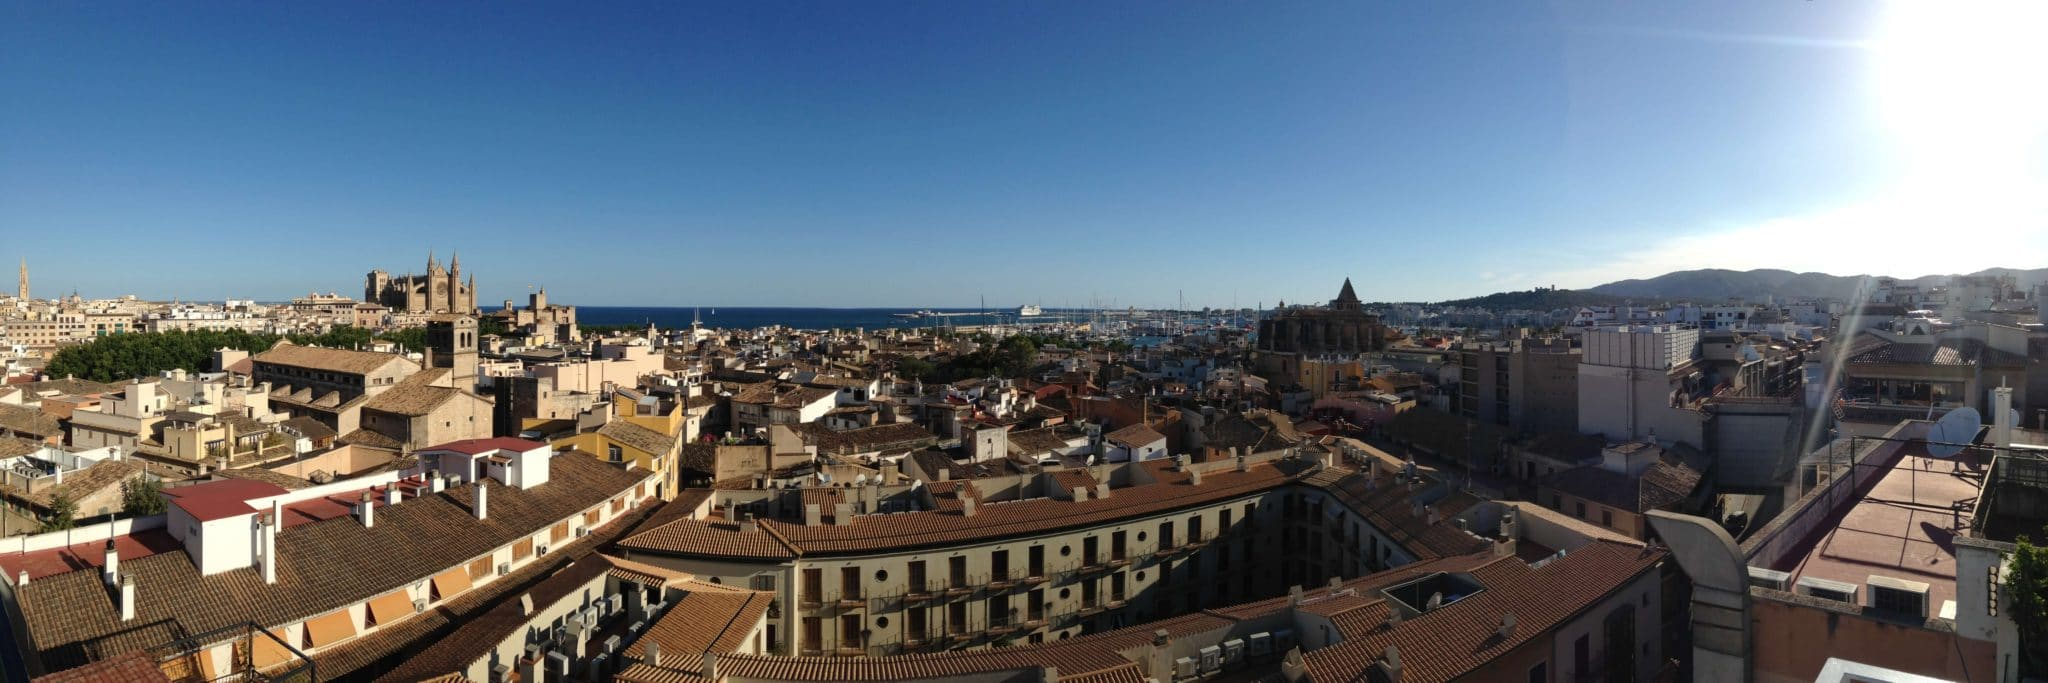 City View Palma de Mallorca